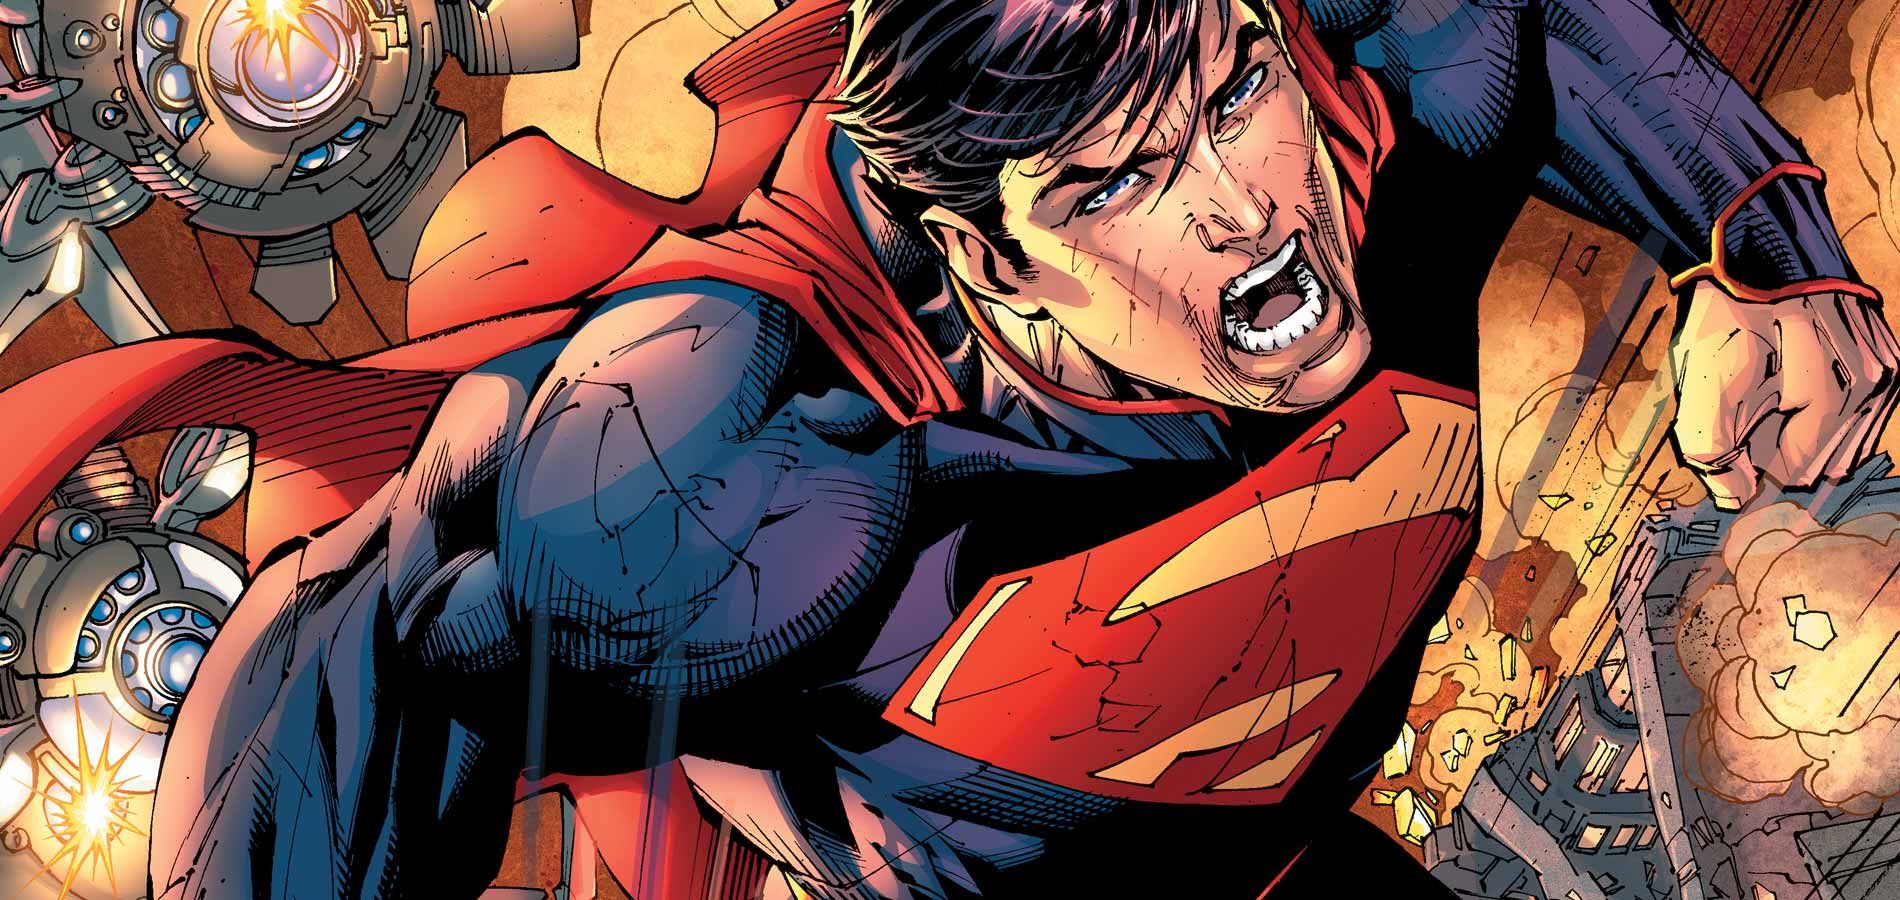 Jim Lee New 52 Superman 1927399 Hd Wallpaper Backgrounds